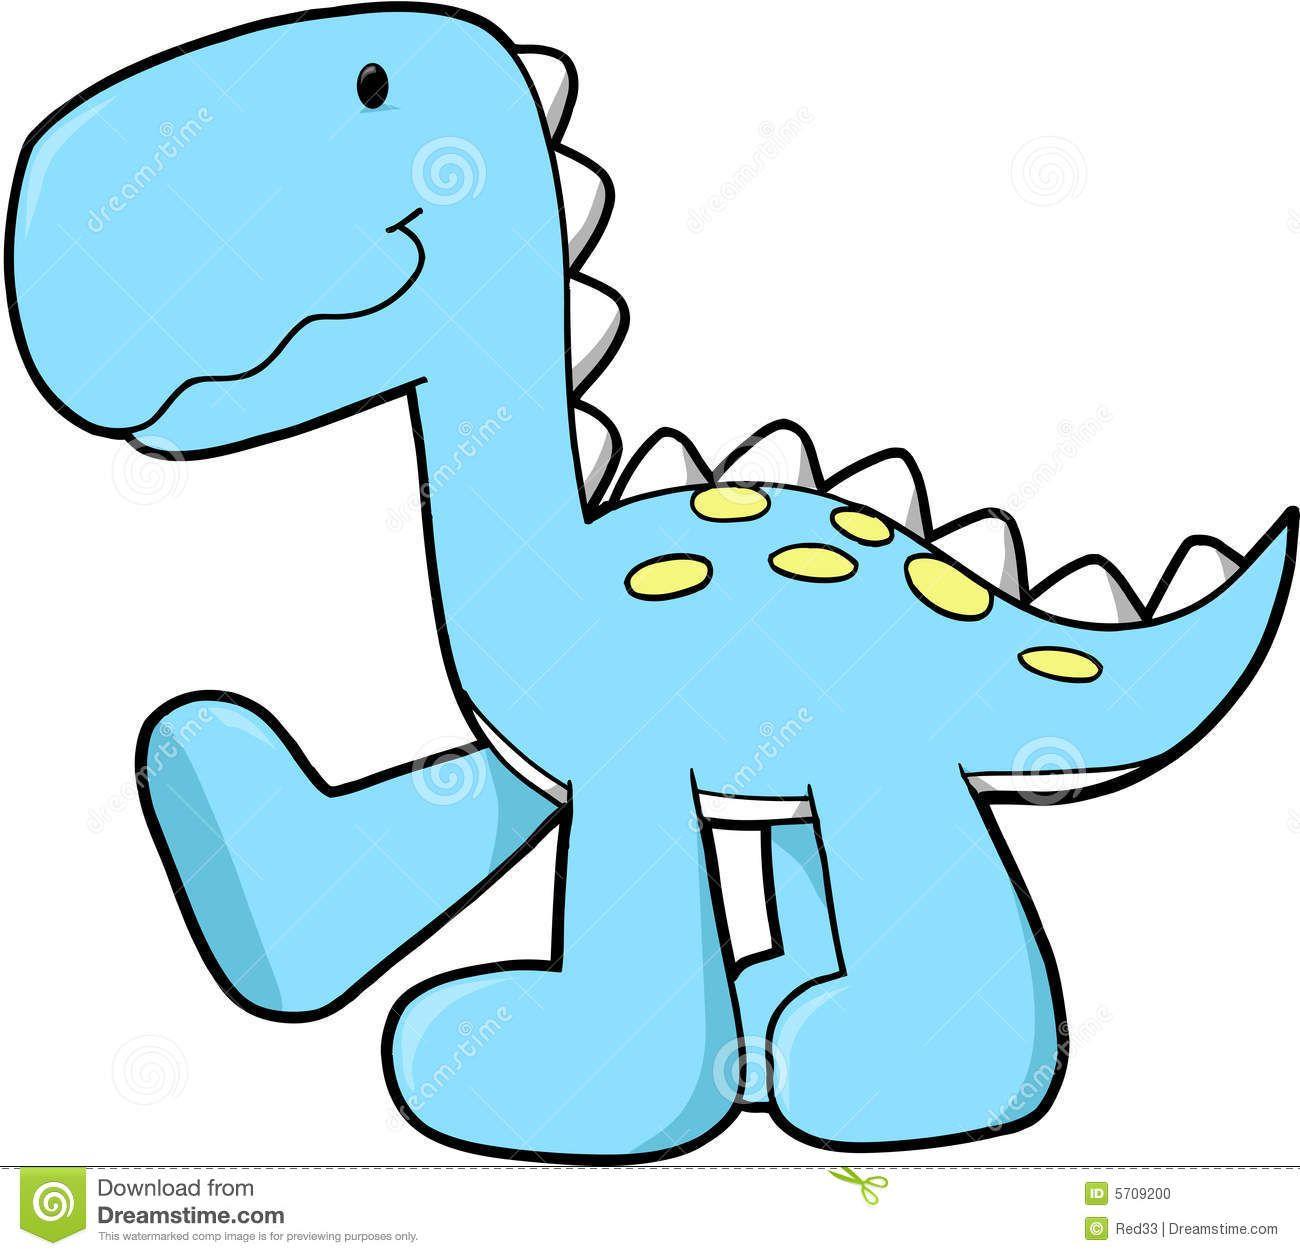 cute dinosaur free clipart [ 1300 x 1256 Pixel ]